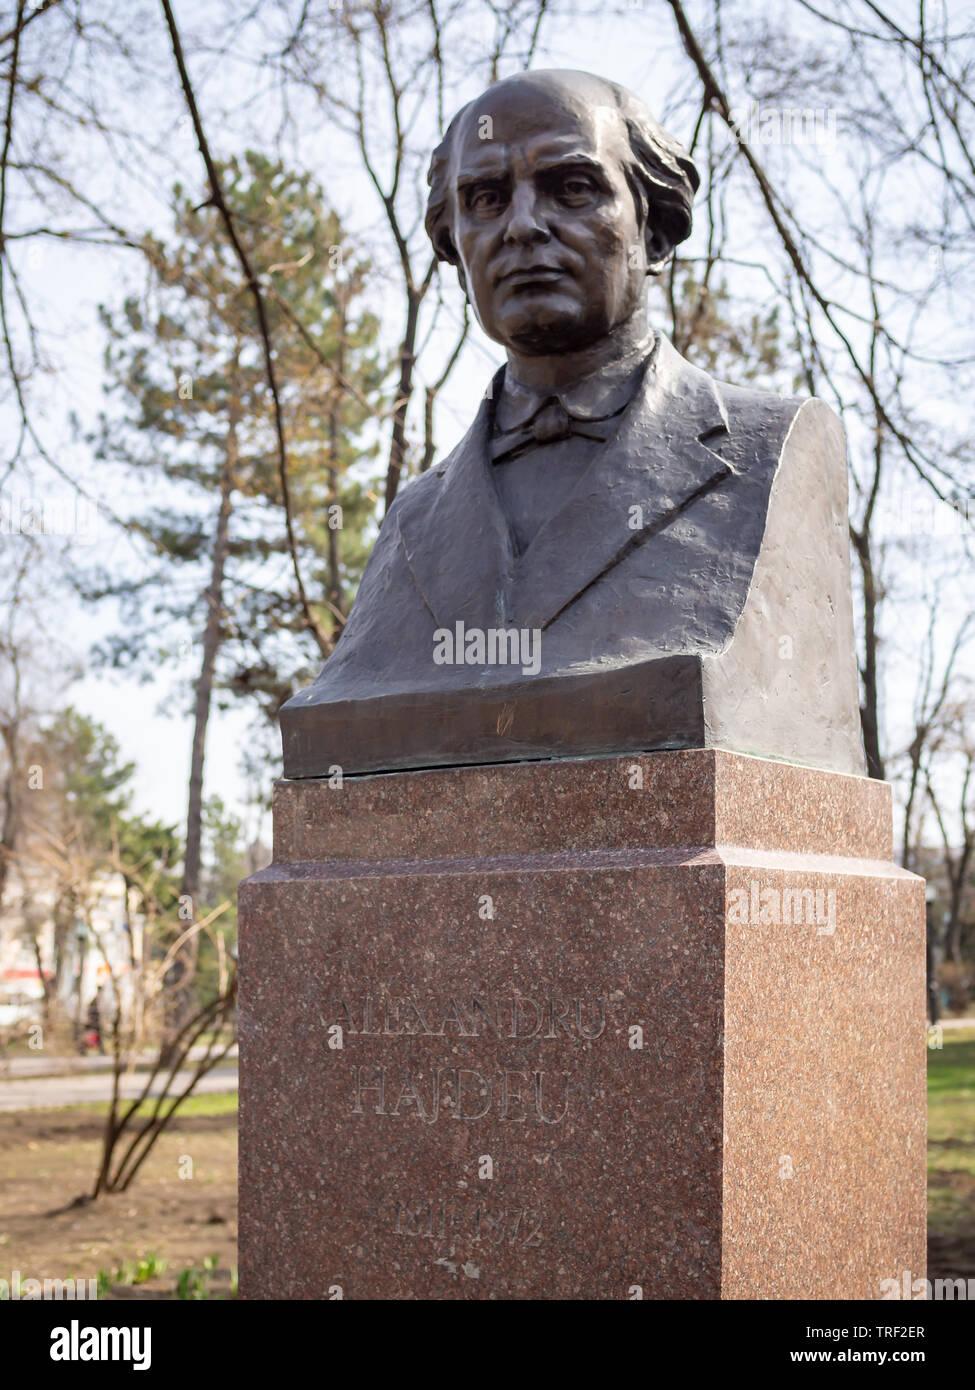 CHISINAU, MOLDOVA-MARCH 21, 2019:  Alexandru Hajdeu bust by Vladislav Krakoveak in the Alley of Classics - Stock Image